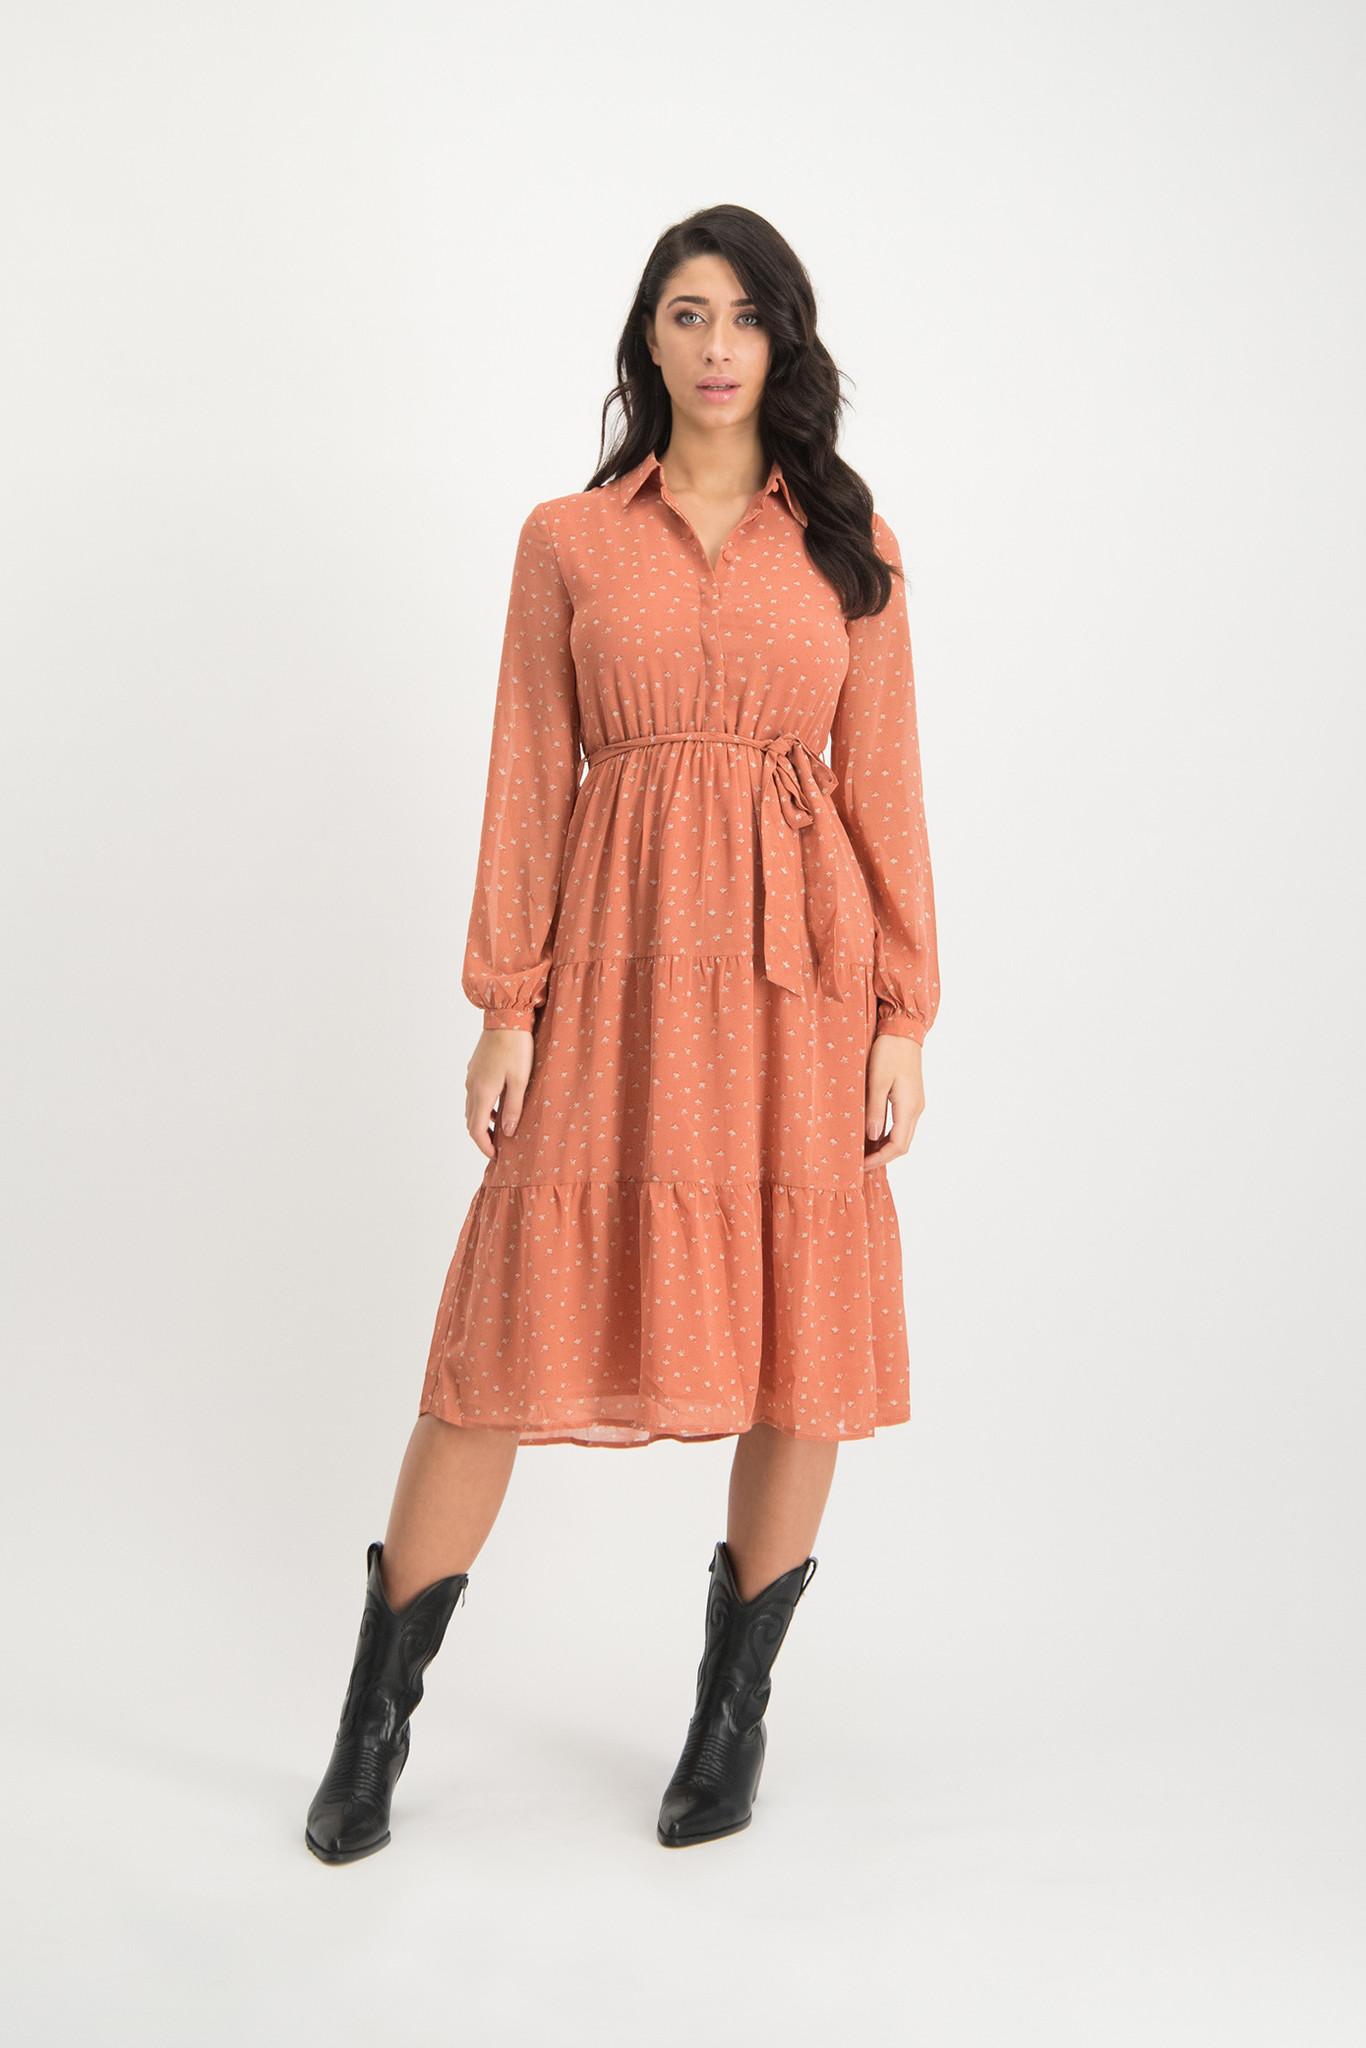 Peach-colored Midi Dress Ellis